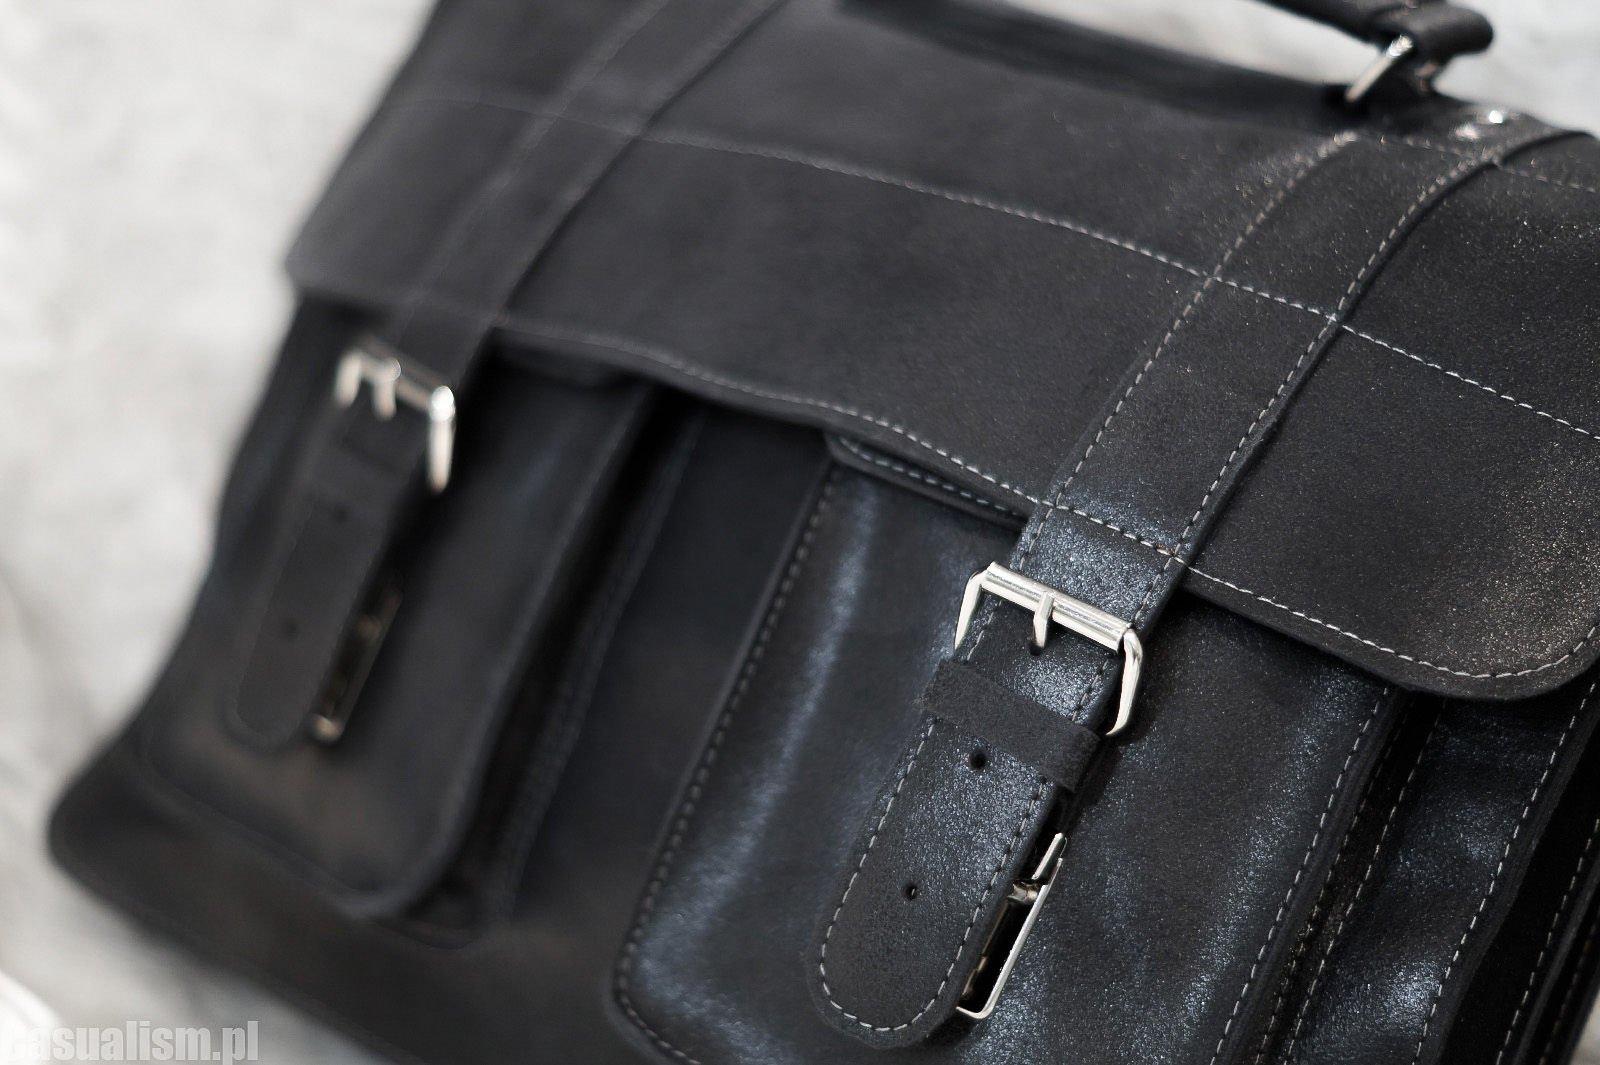 skórzana torba męska, męska torba ze skóry, skóra torba, męska torba skórkowa, skórzana torba dla faceta